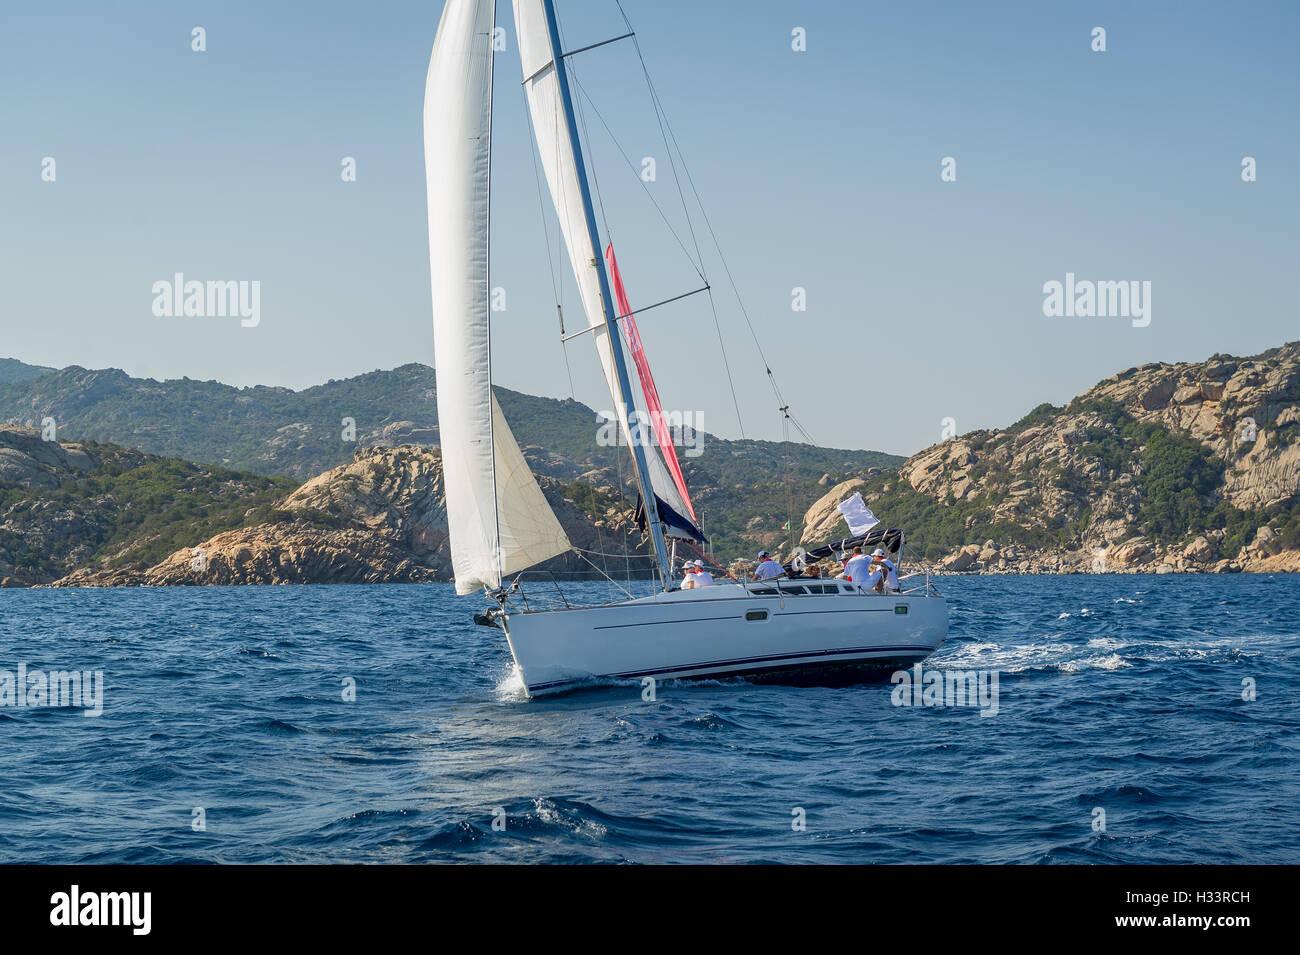 Cruising sailboat sailing near Sardinia island shores. - Stock Image